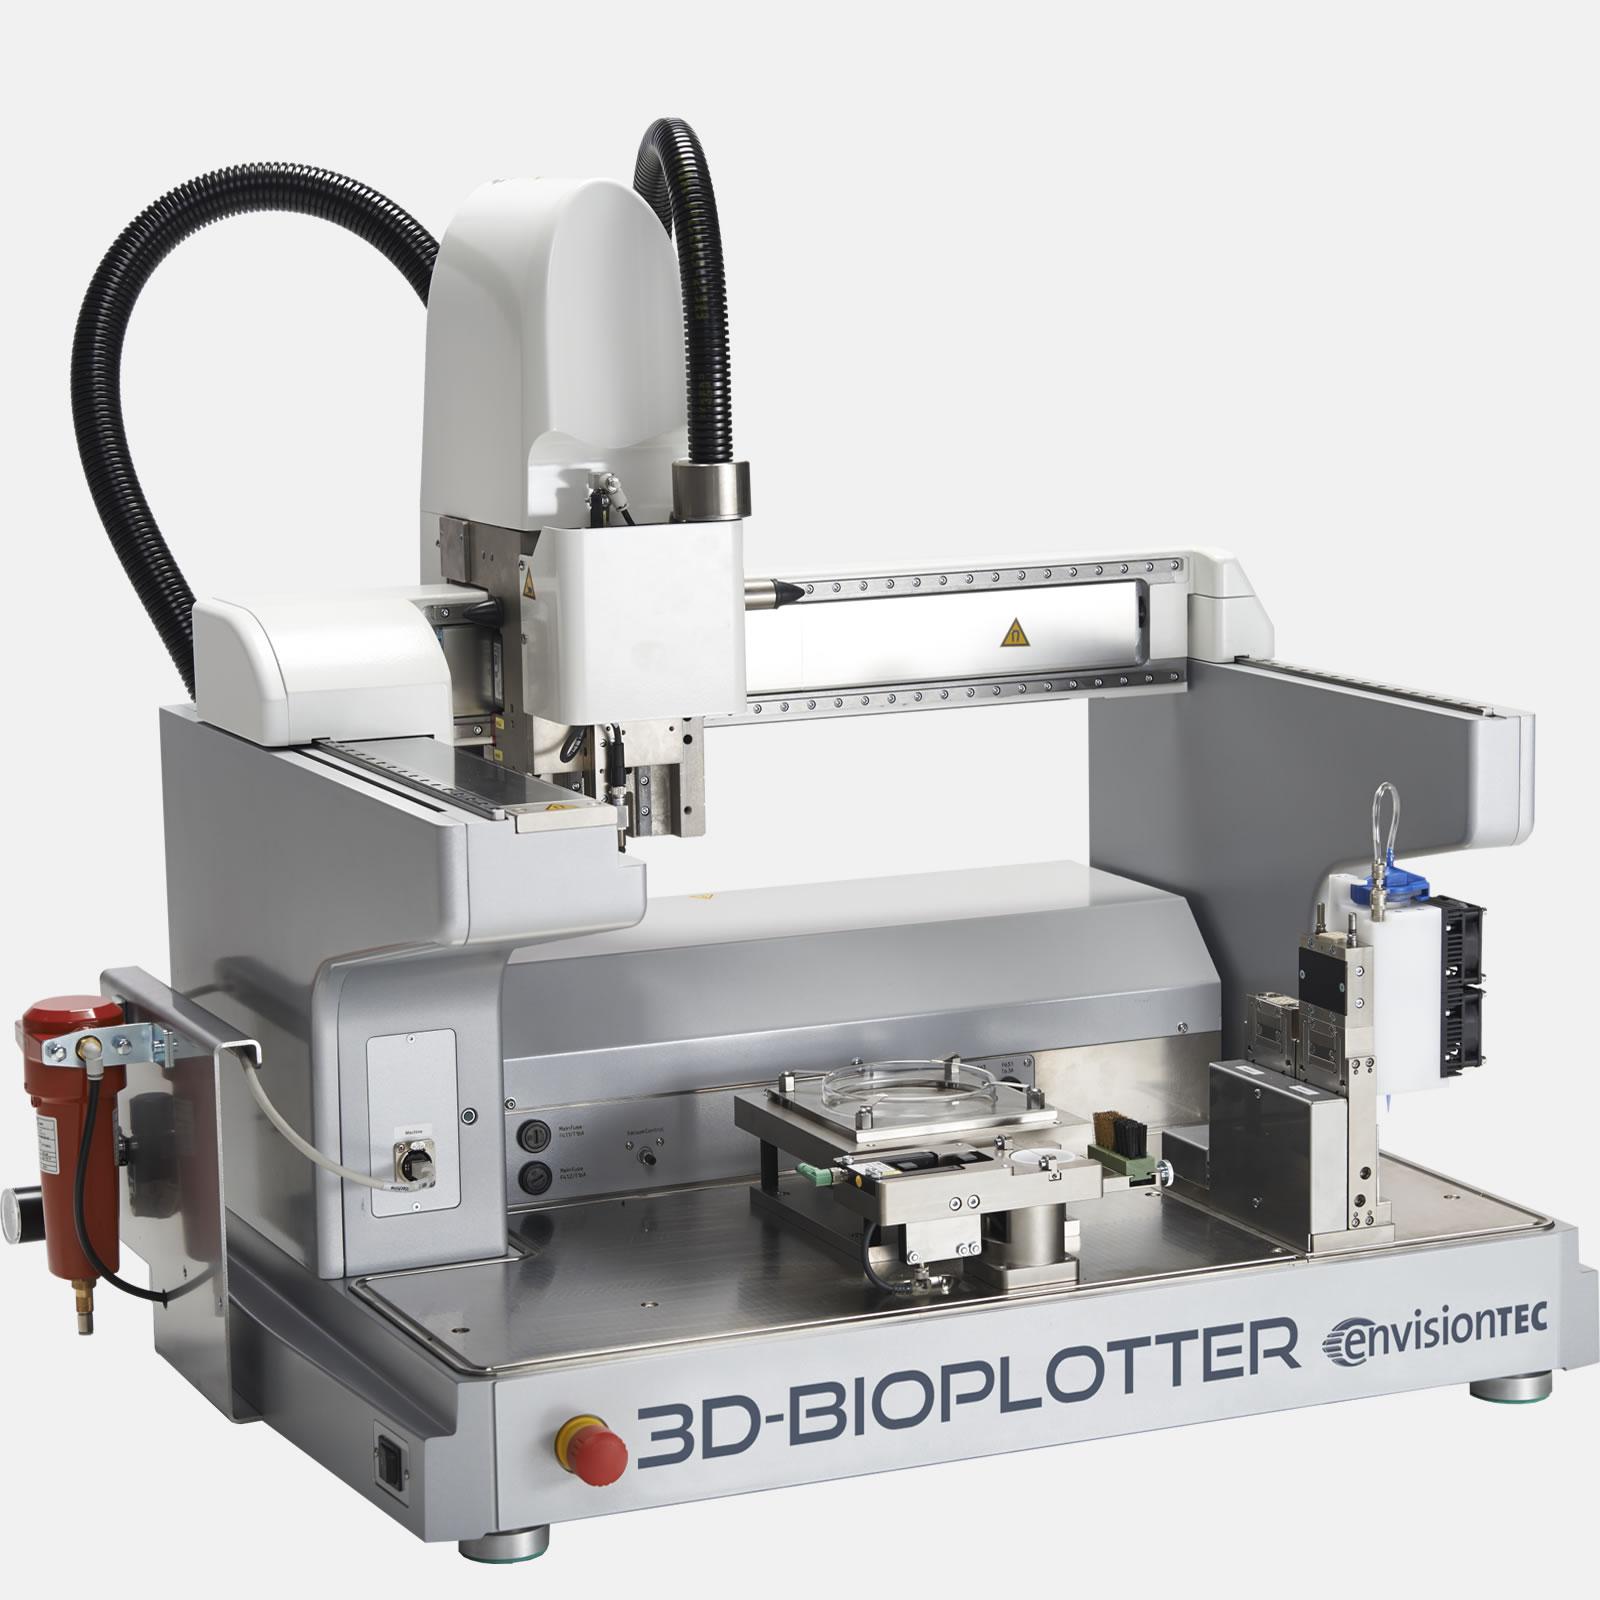 EnvisionTec 3D Bioplotter Mars Lunar Simulant soil